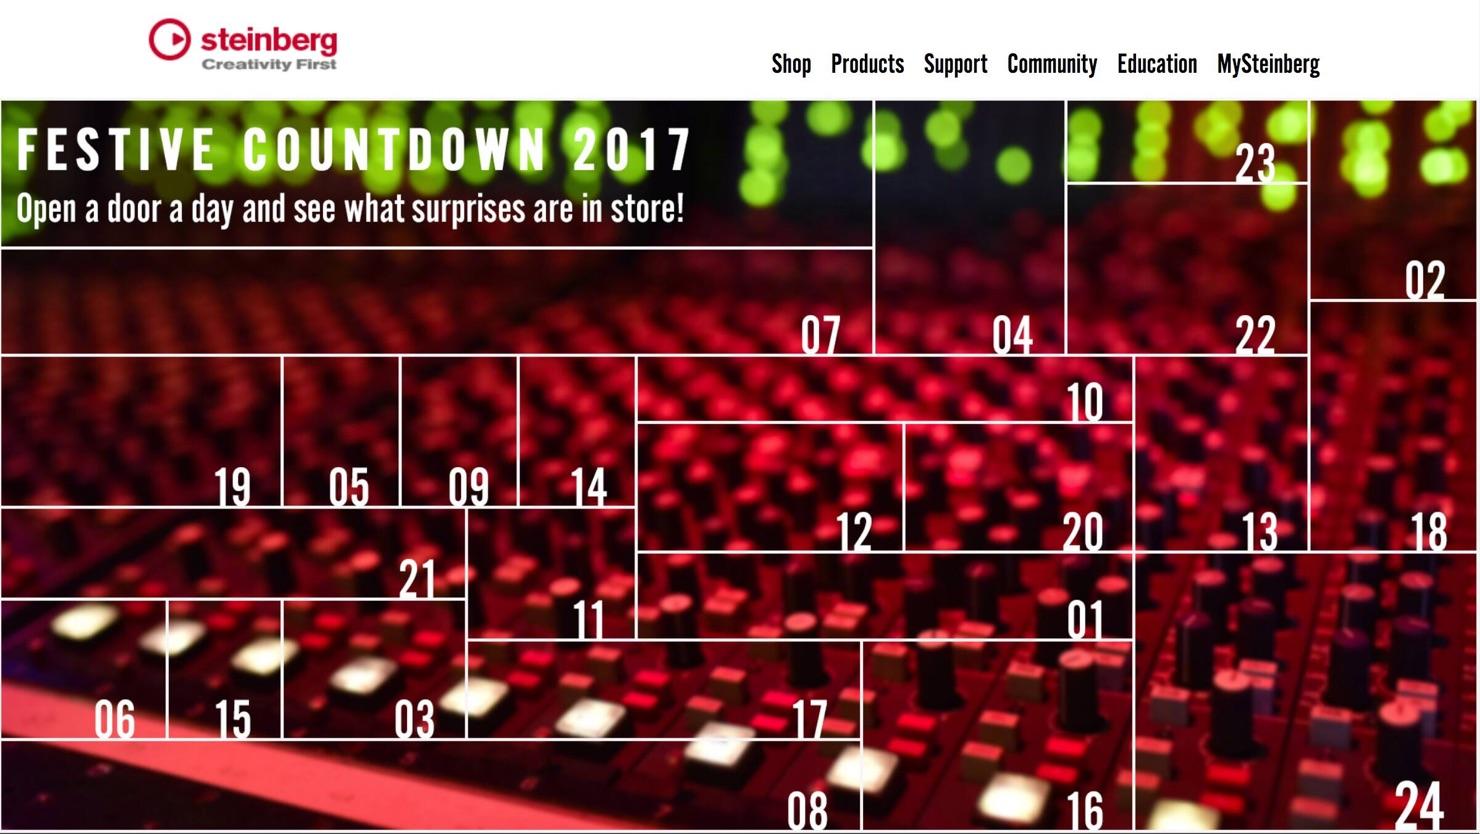 Steinberg Festive Countdown 2017-1-1